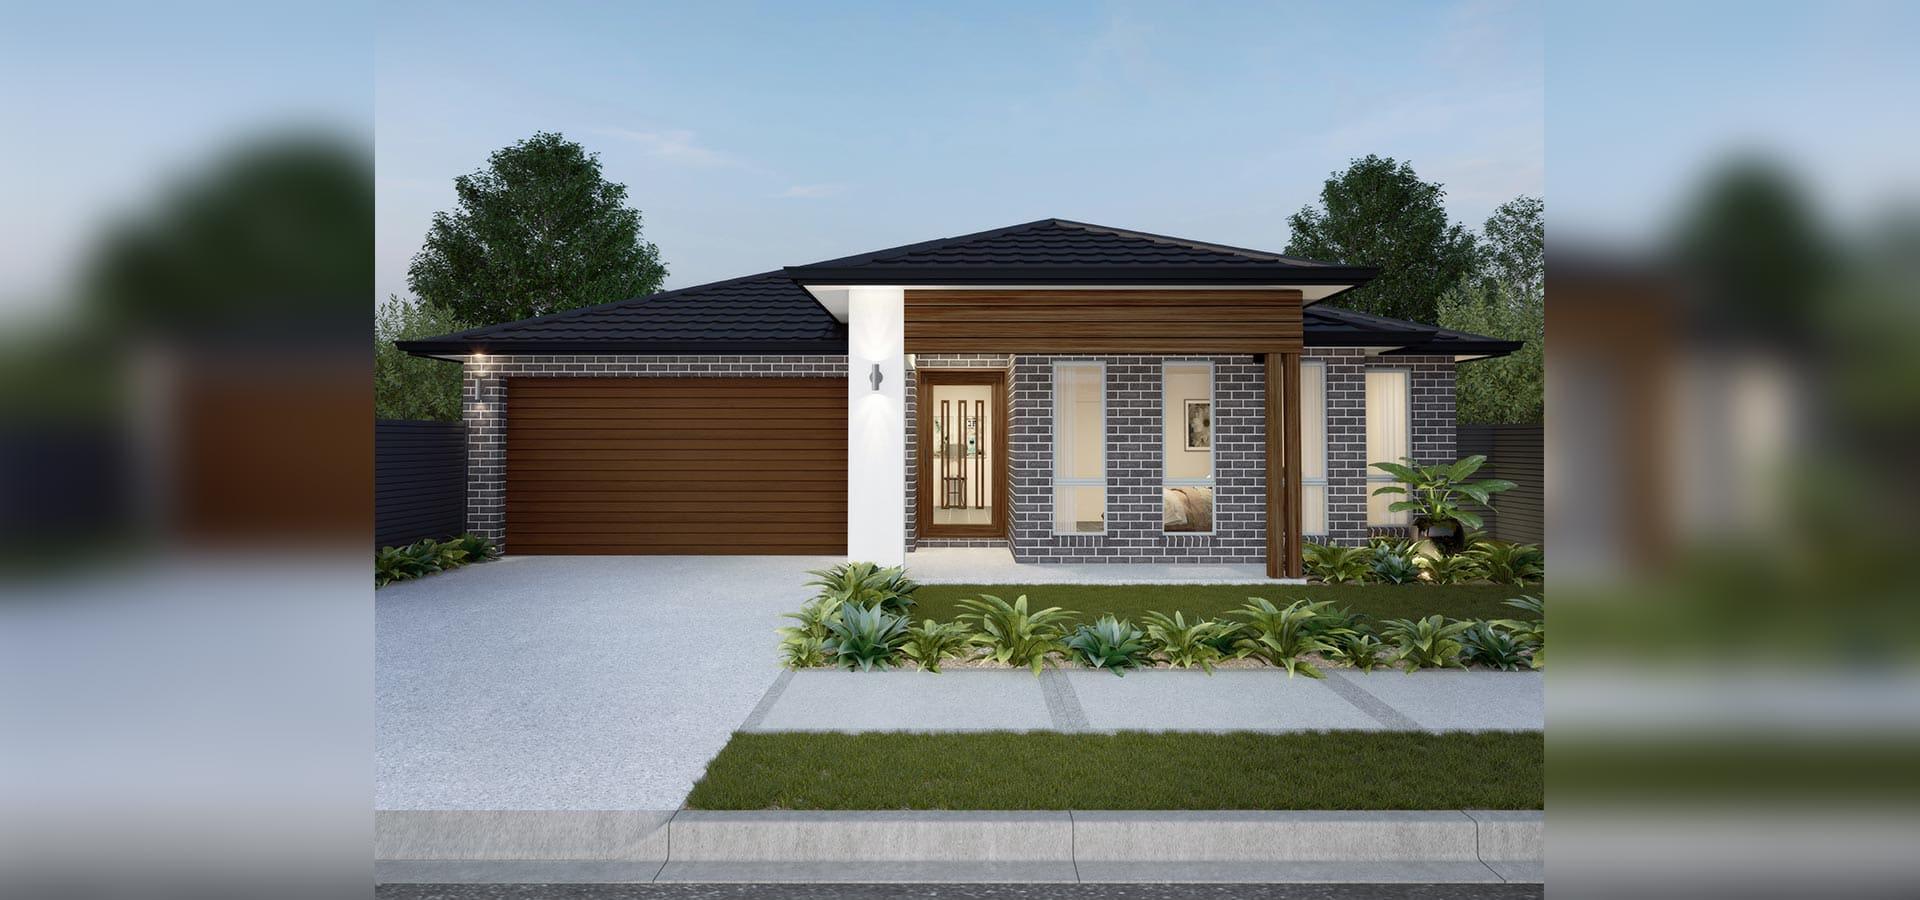 Chrysanthemum-Single-House-Design updated